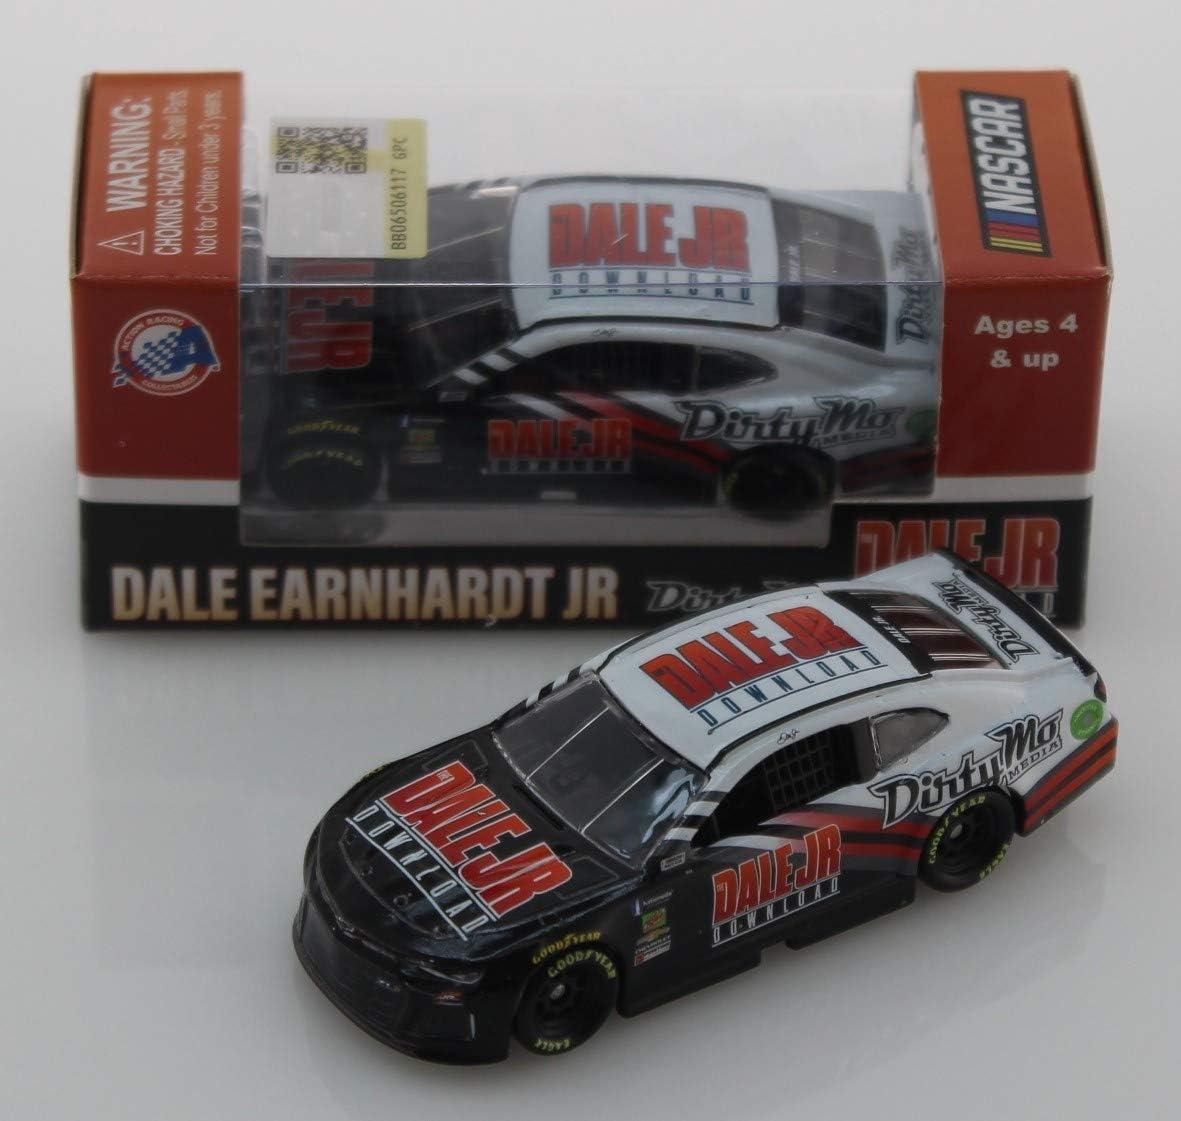 Lionel Racing Dale Earnhardt Jr 2020 Dale Jr Download//Dirty Mo Media NASCAR Diecast Car 1:64